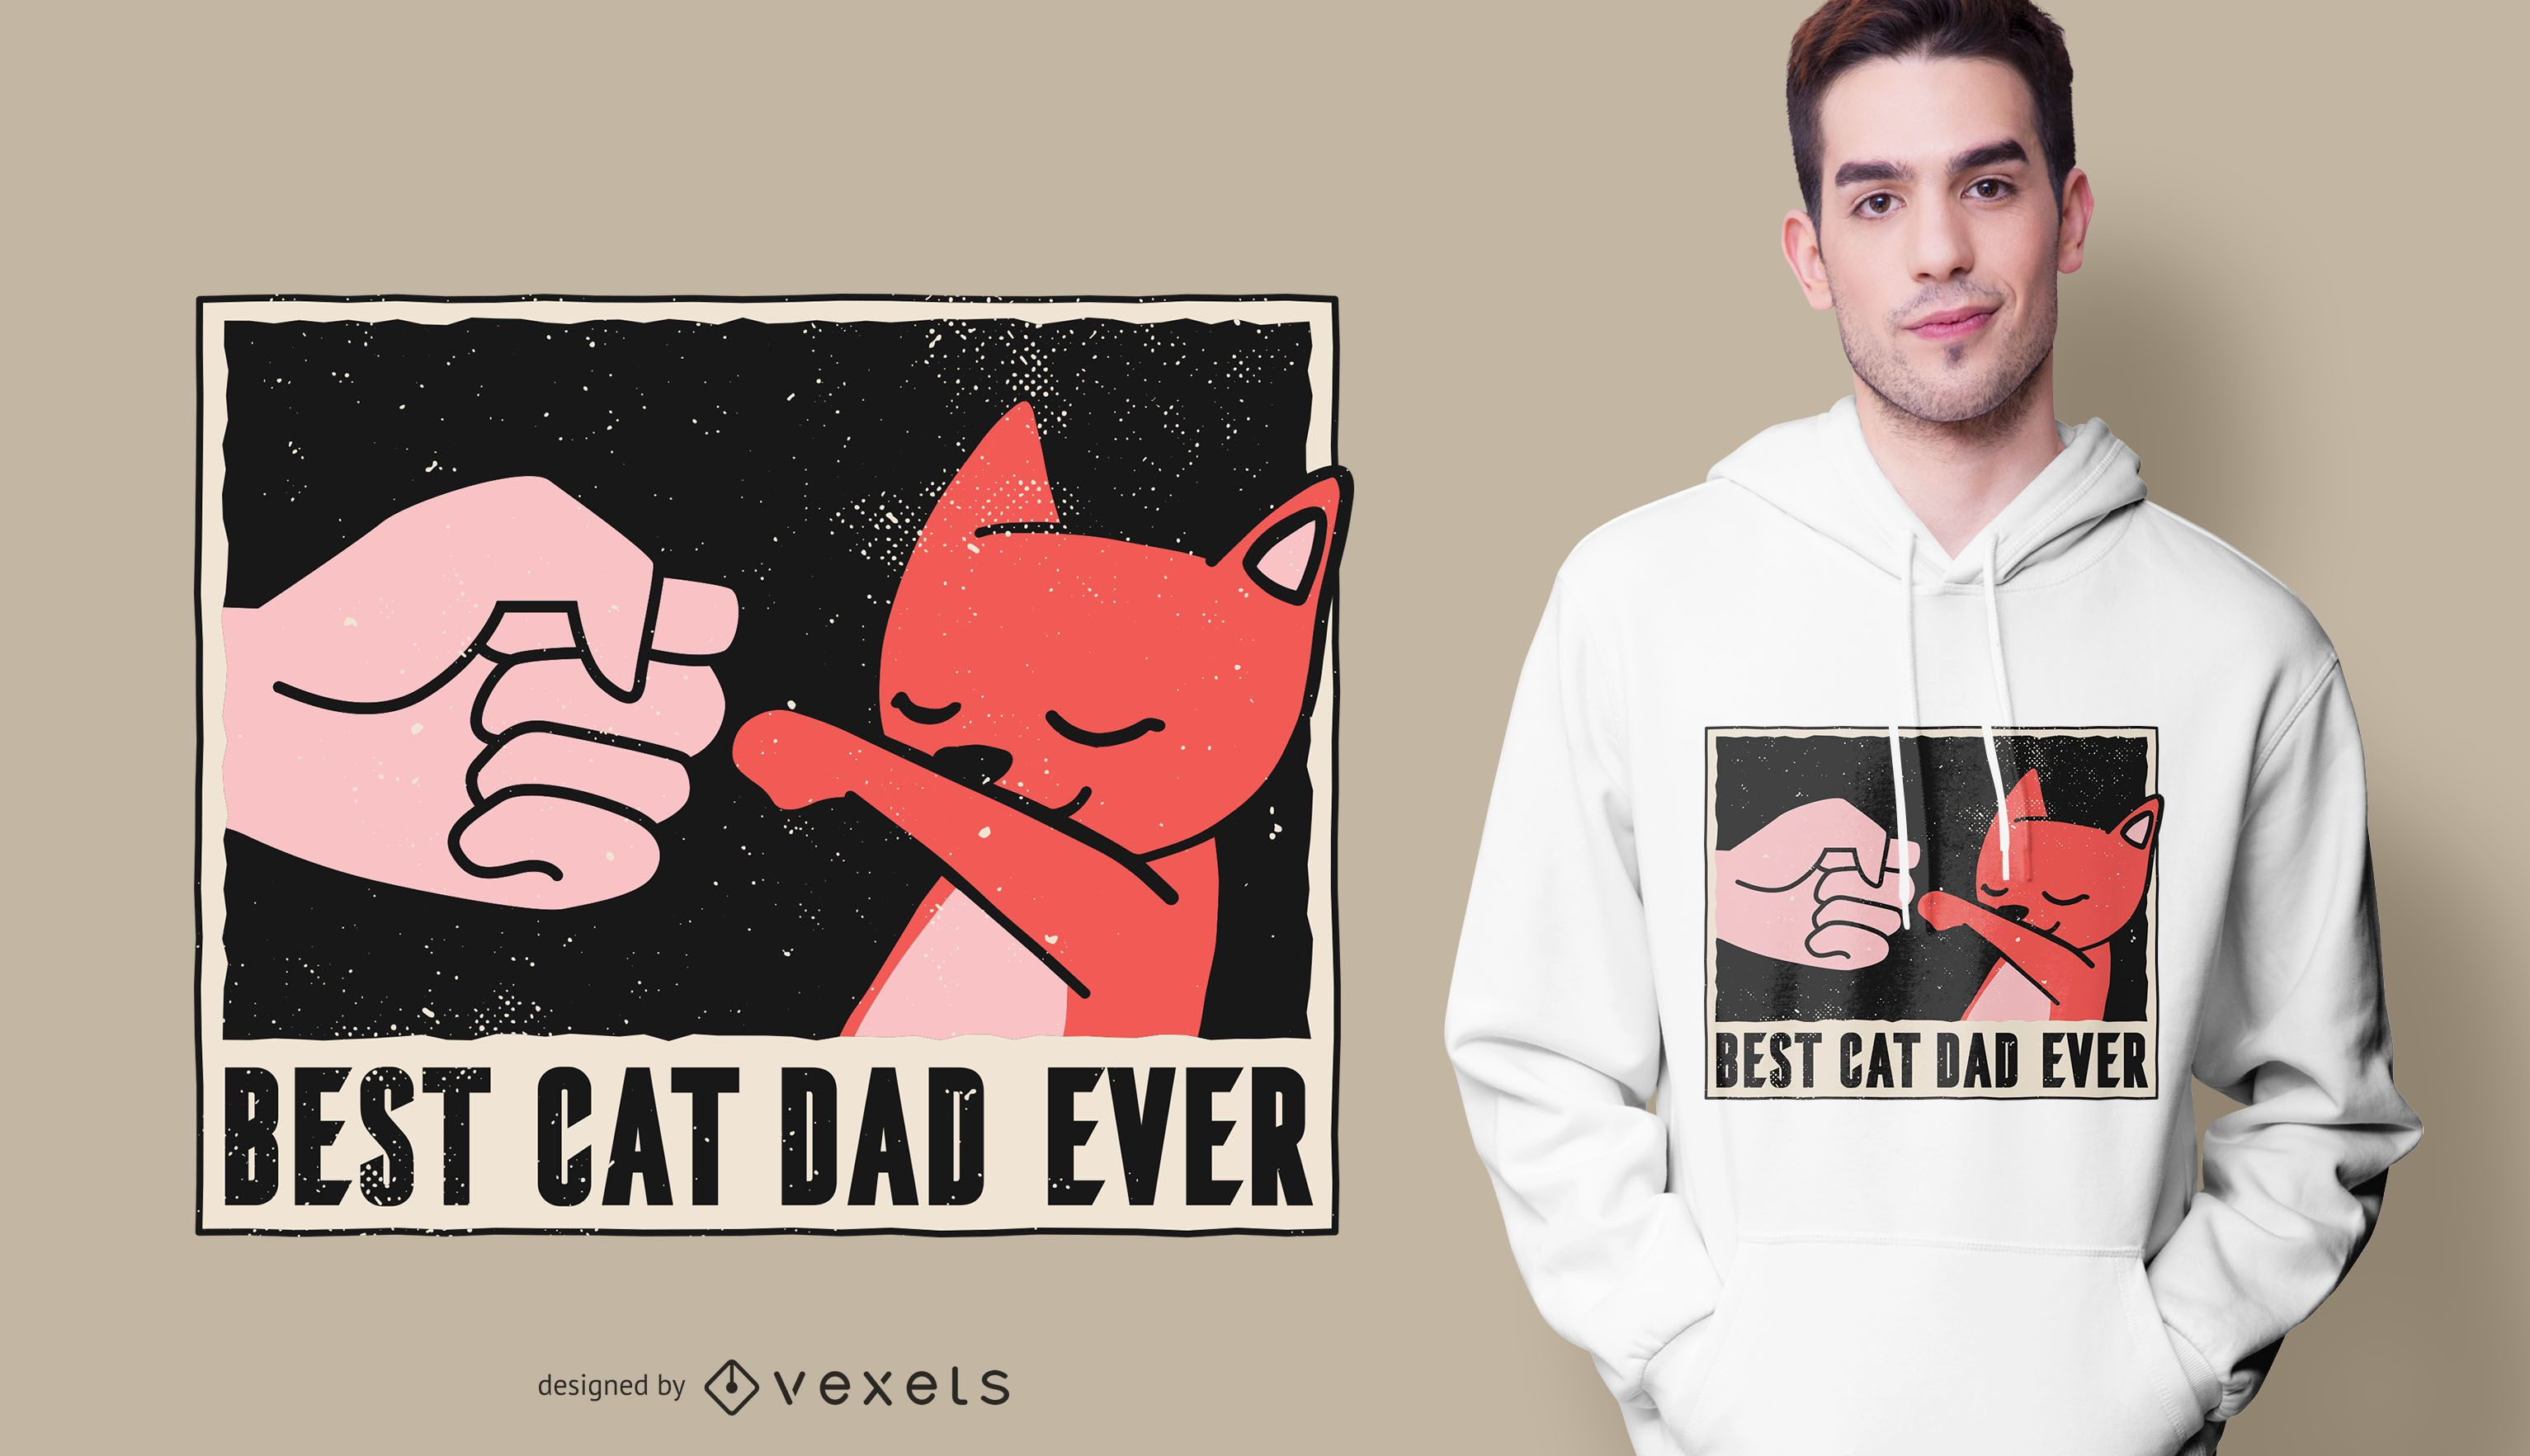 Best Cat Dad Ever T-shirt Design